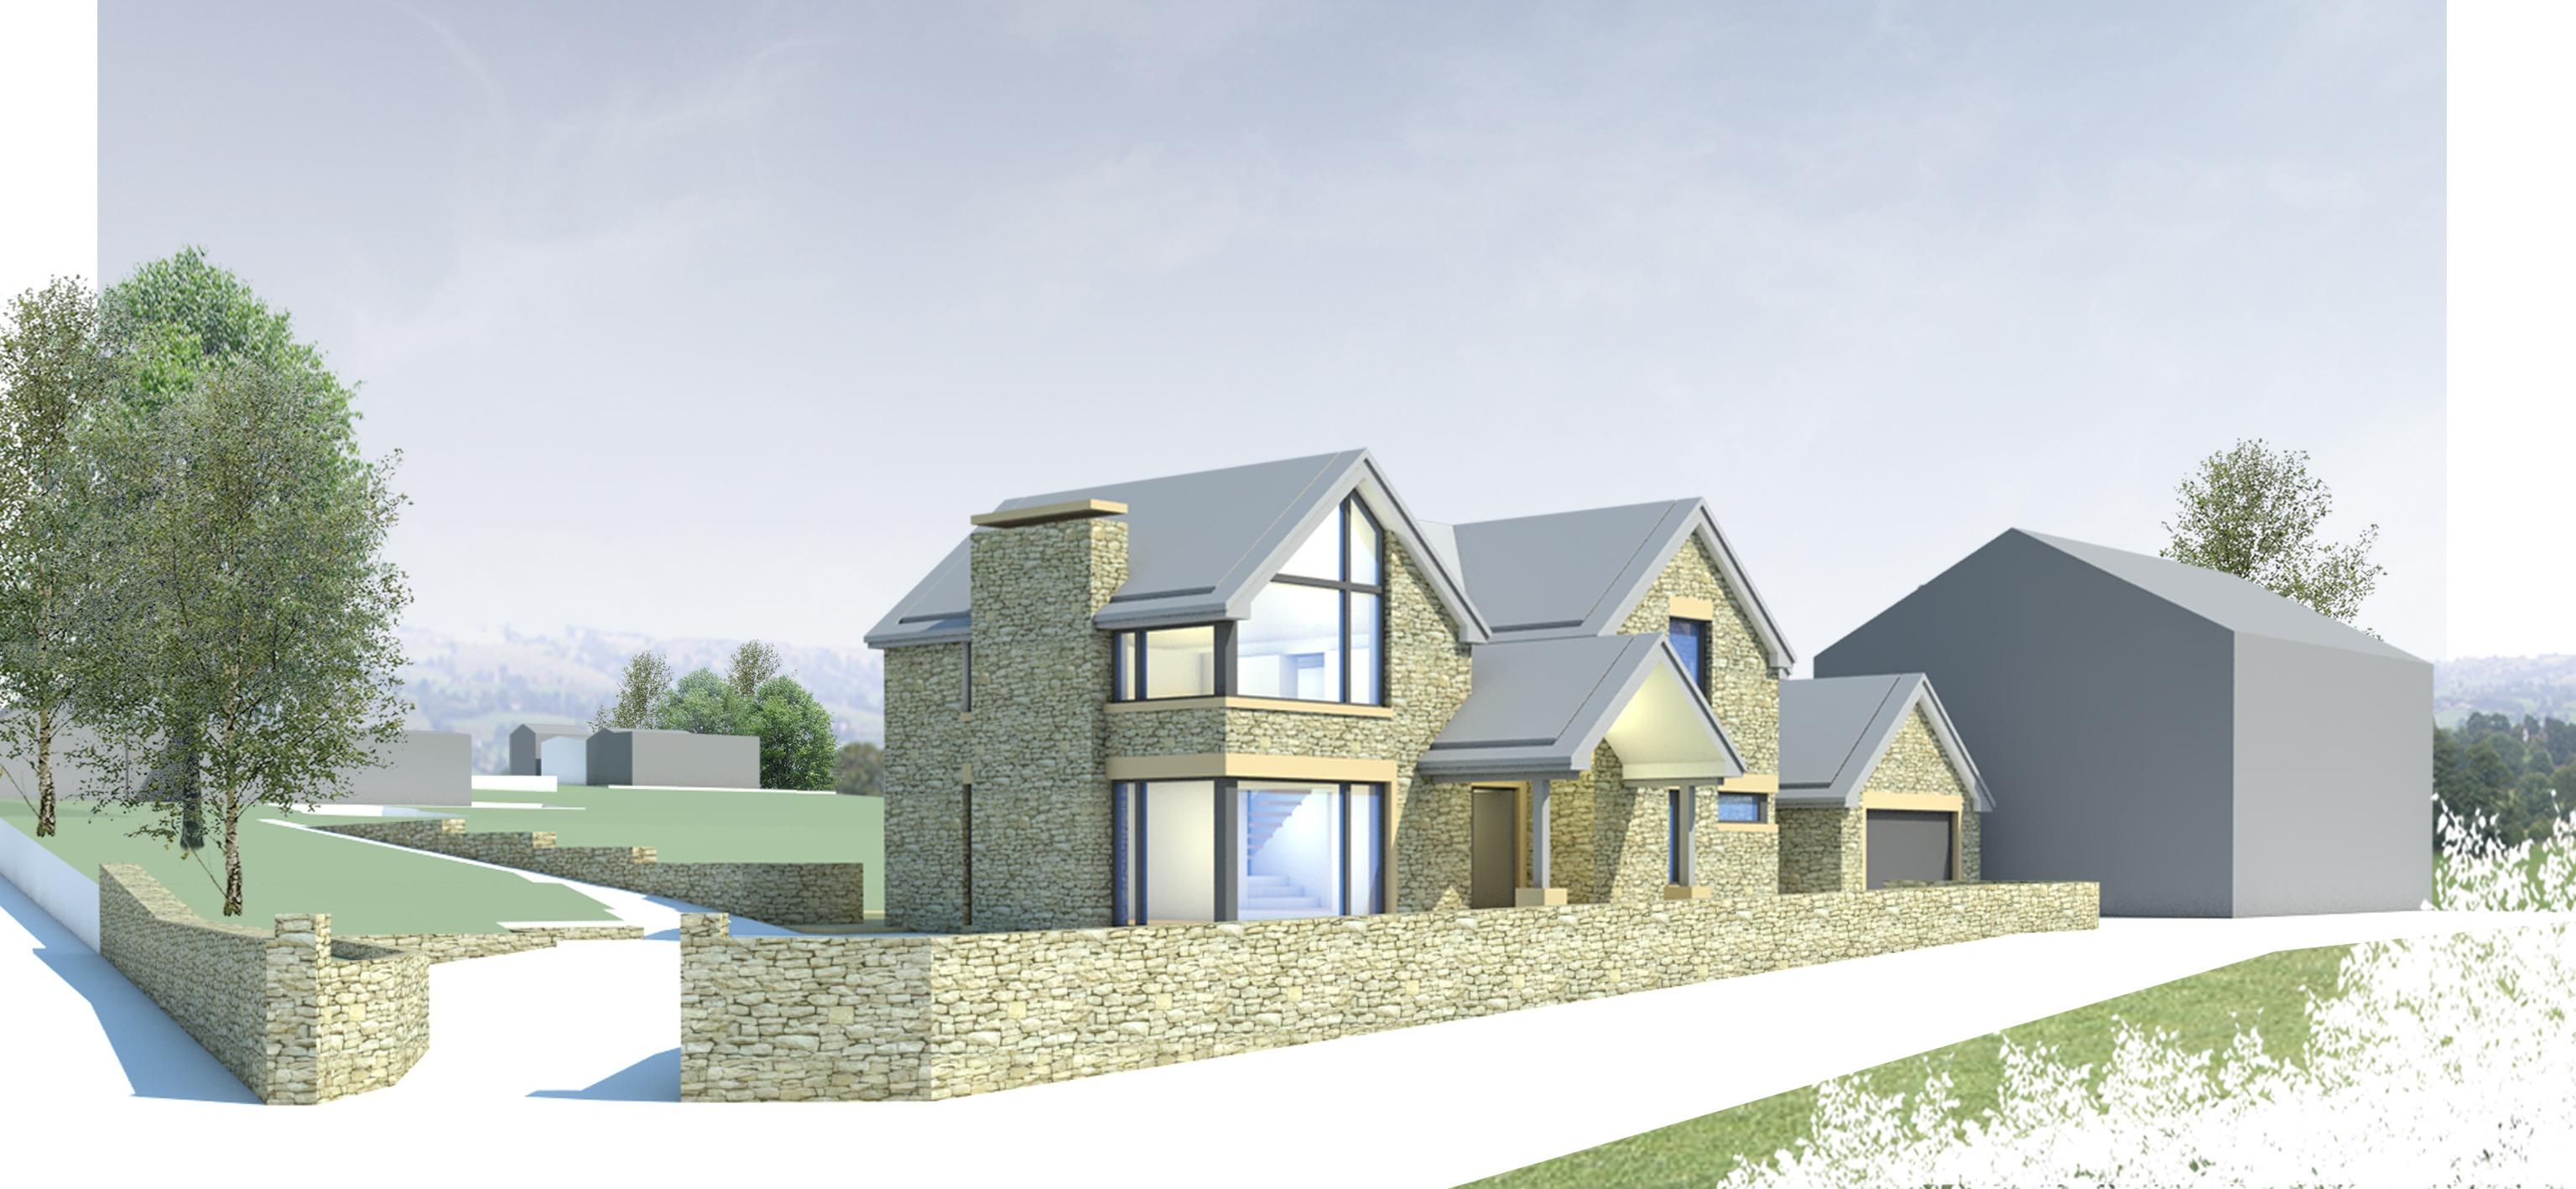 Stanton Andrews house design option 3